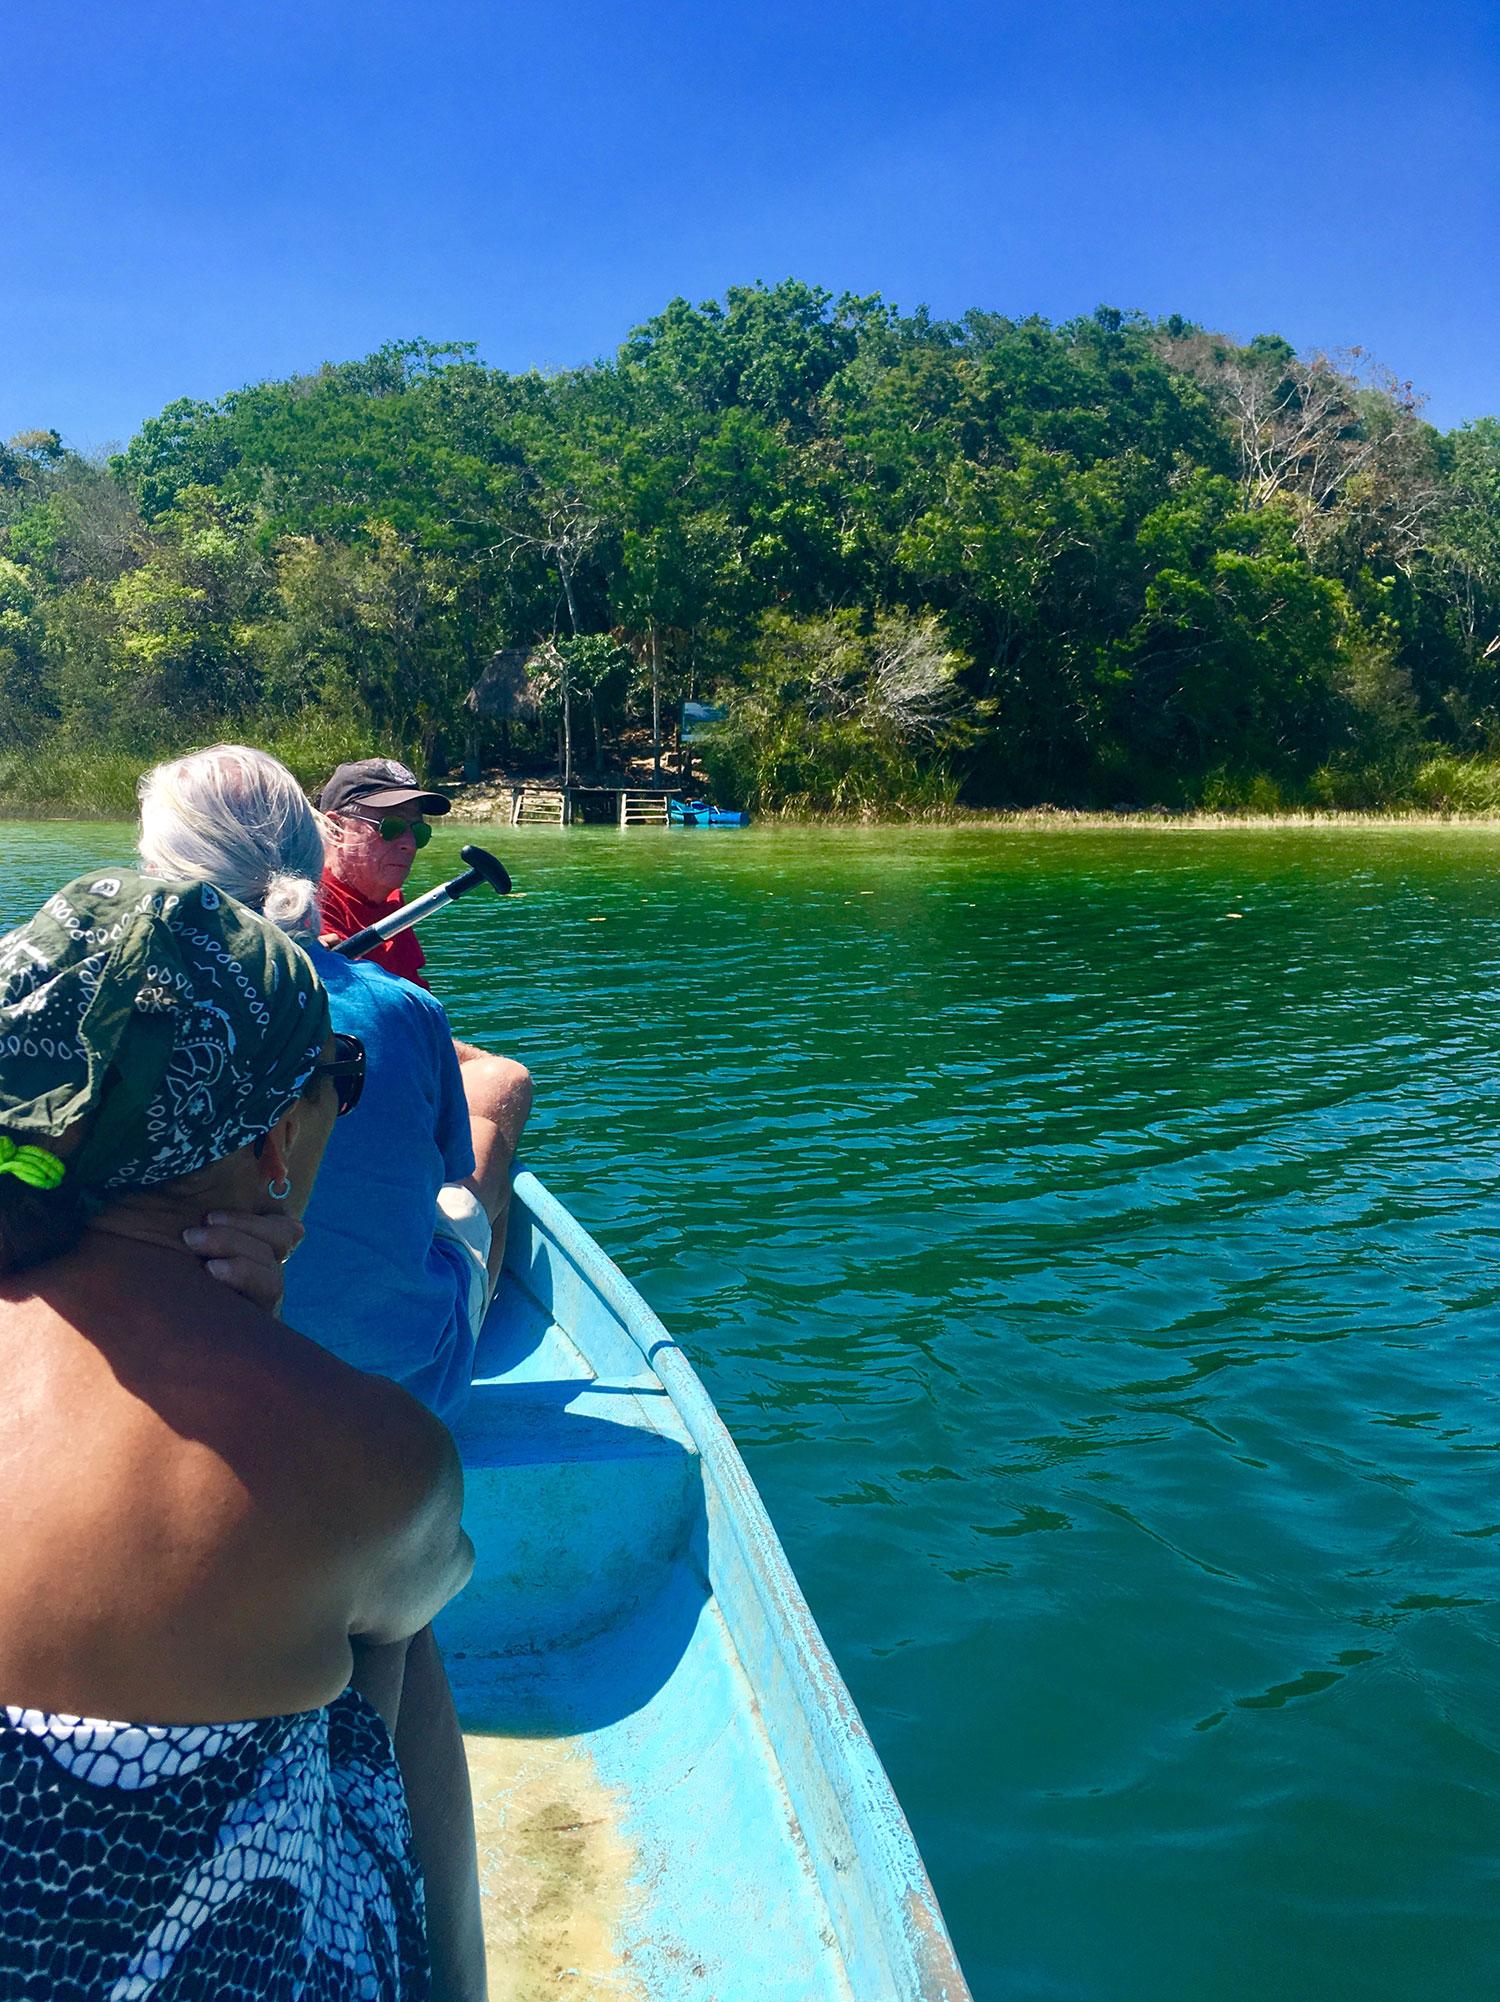 Hammocks_and_Ruins_What_to_Do_Yucatan_jungle_lake_lagoon_wild_swim_kayak_Punta_Laguna_14.jpg